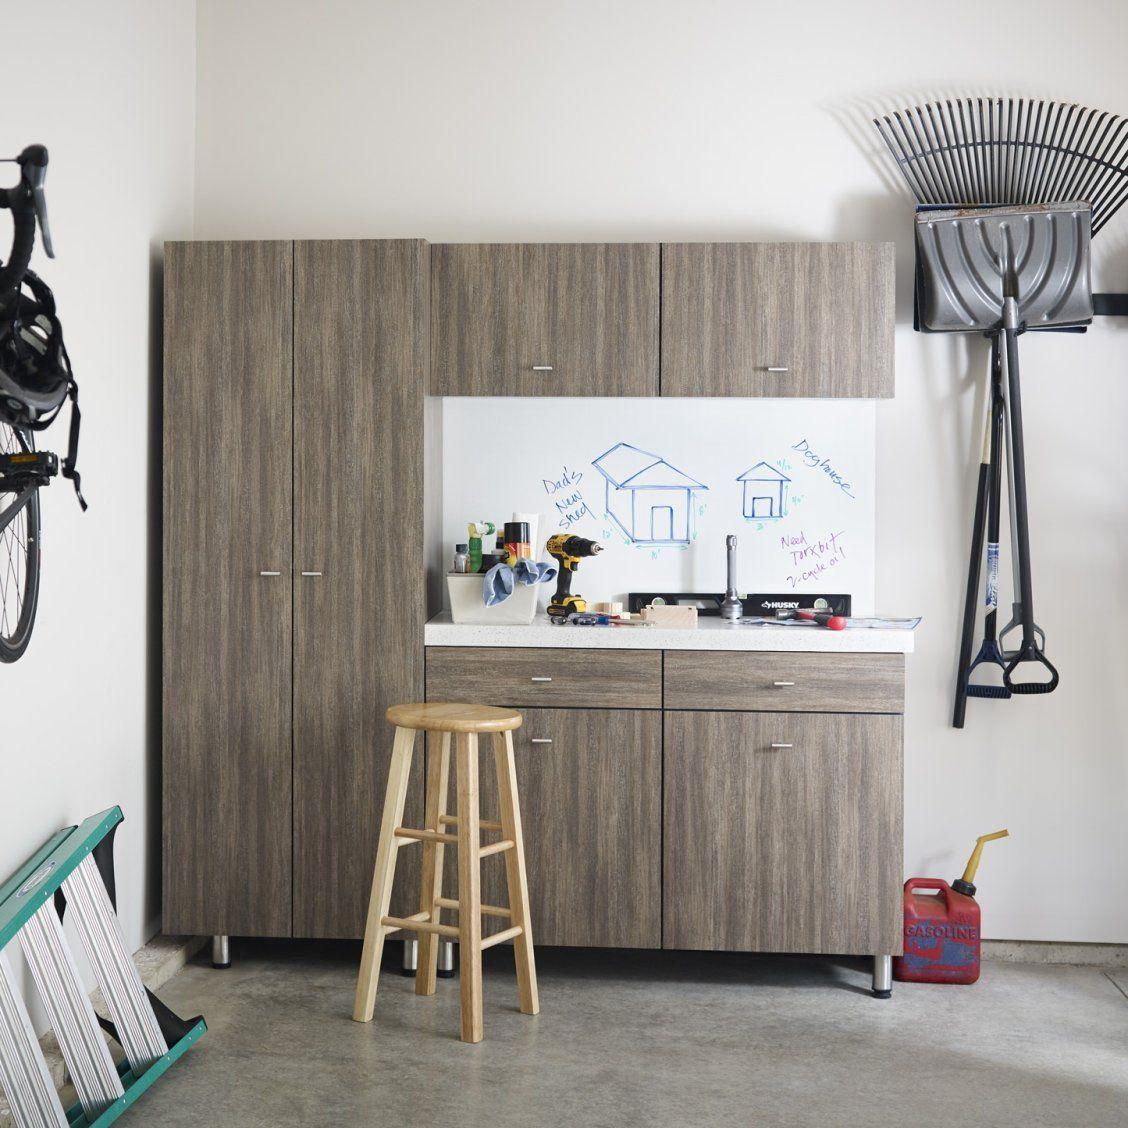 Use Formica Laminate To Create A Custom Workbench In Your Garage Pictured Cabinets 8915 Walnut Fiberwood Backsplash